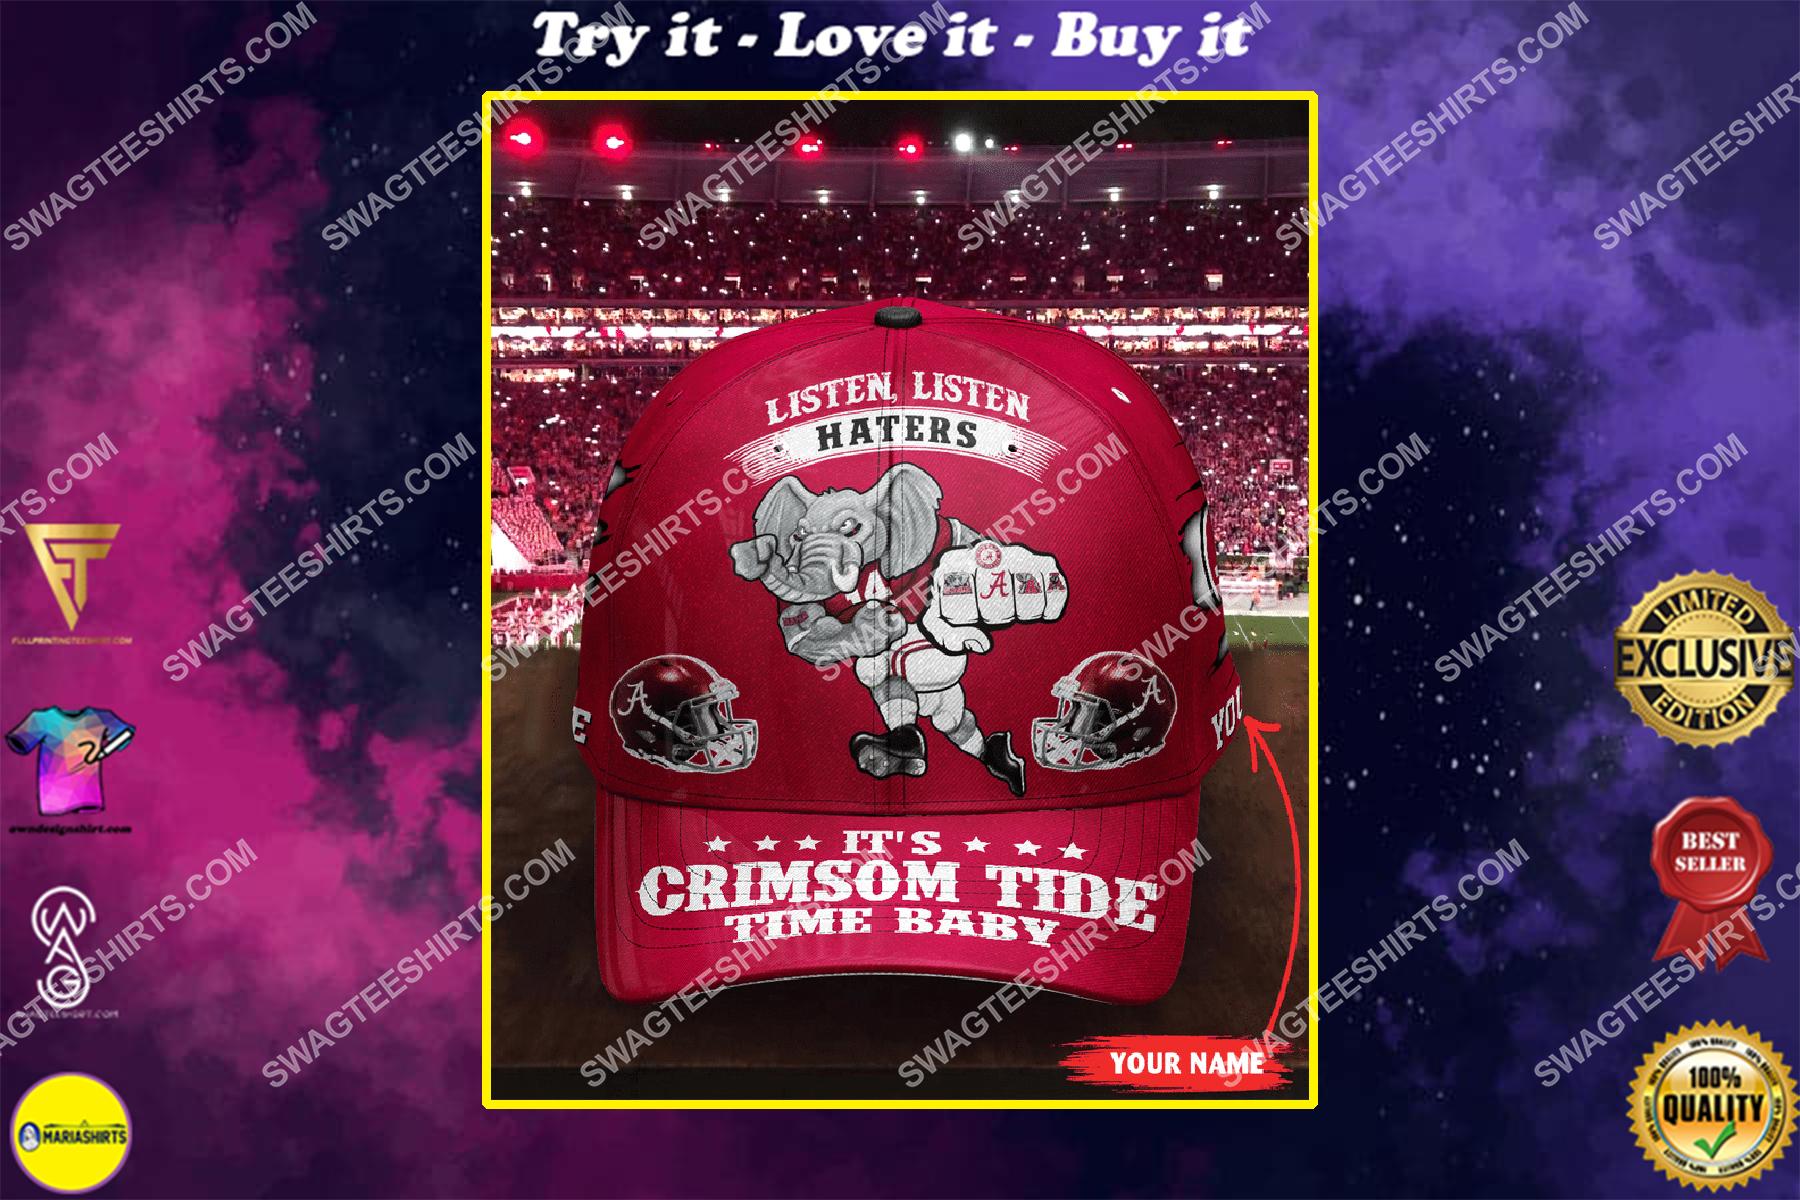 custom name listen haters it's crimson tide time baby full printing cap